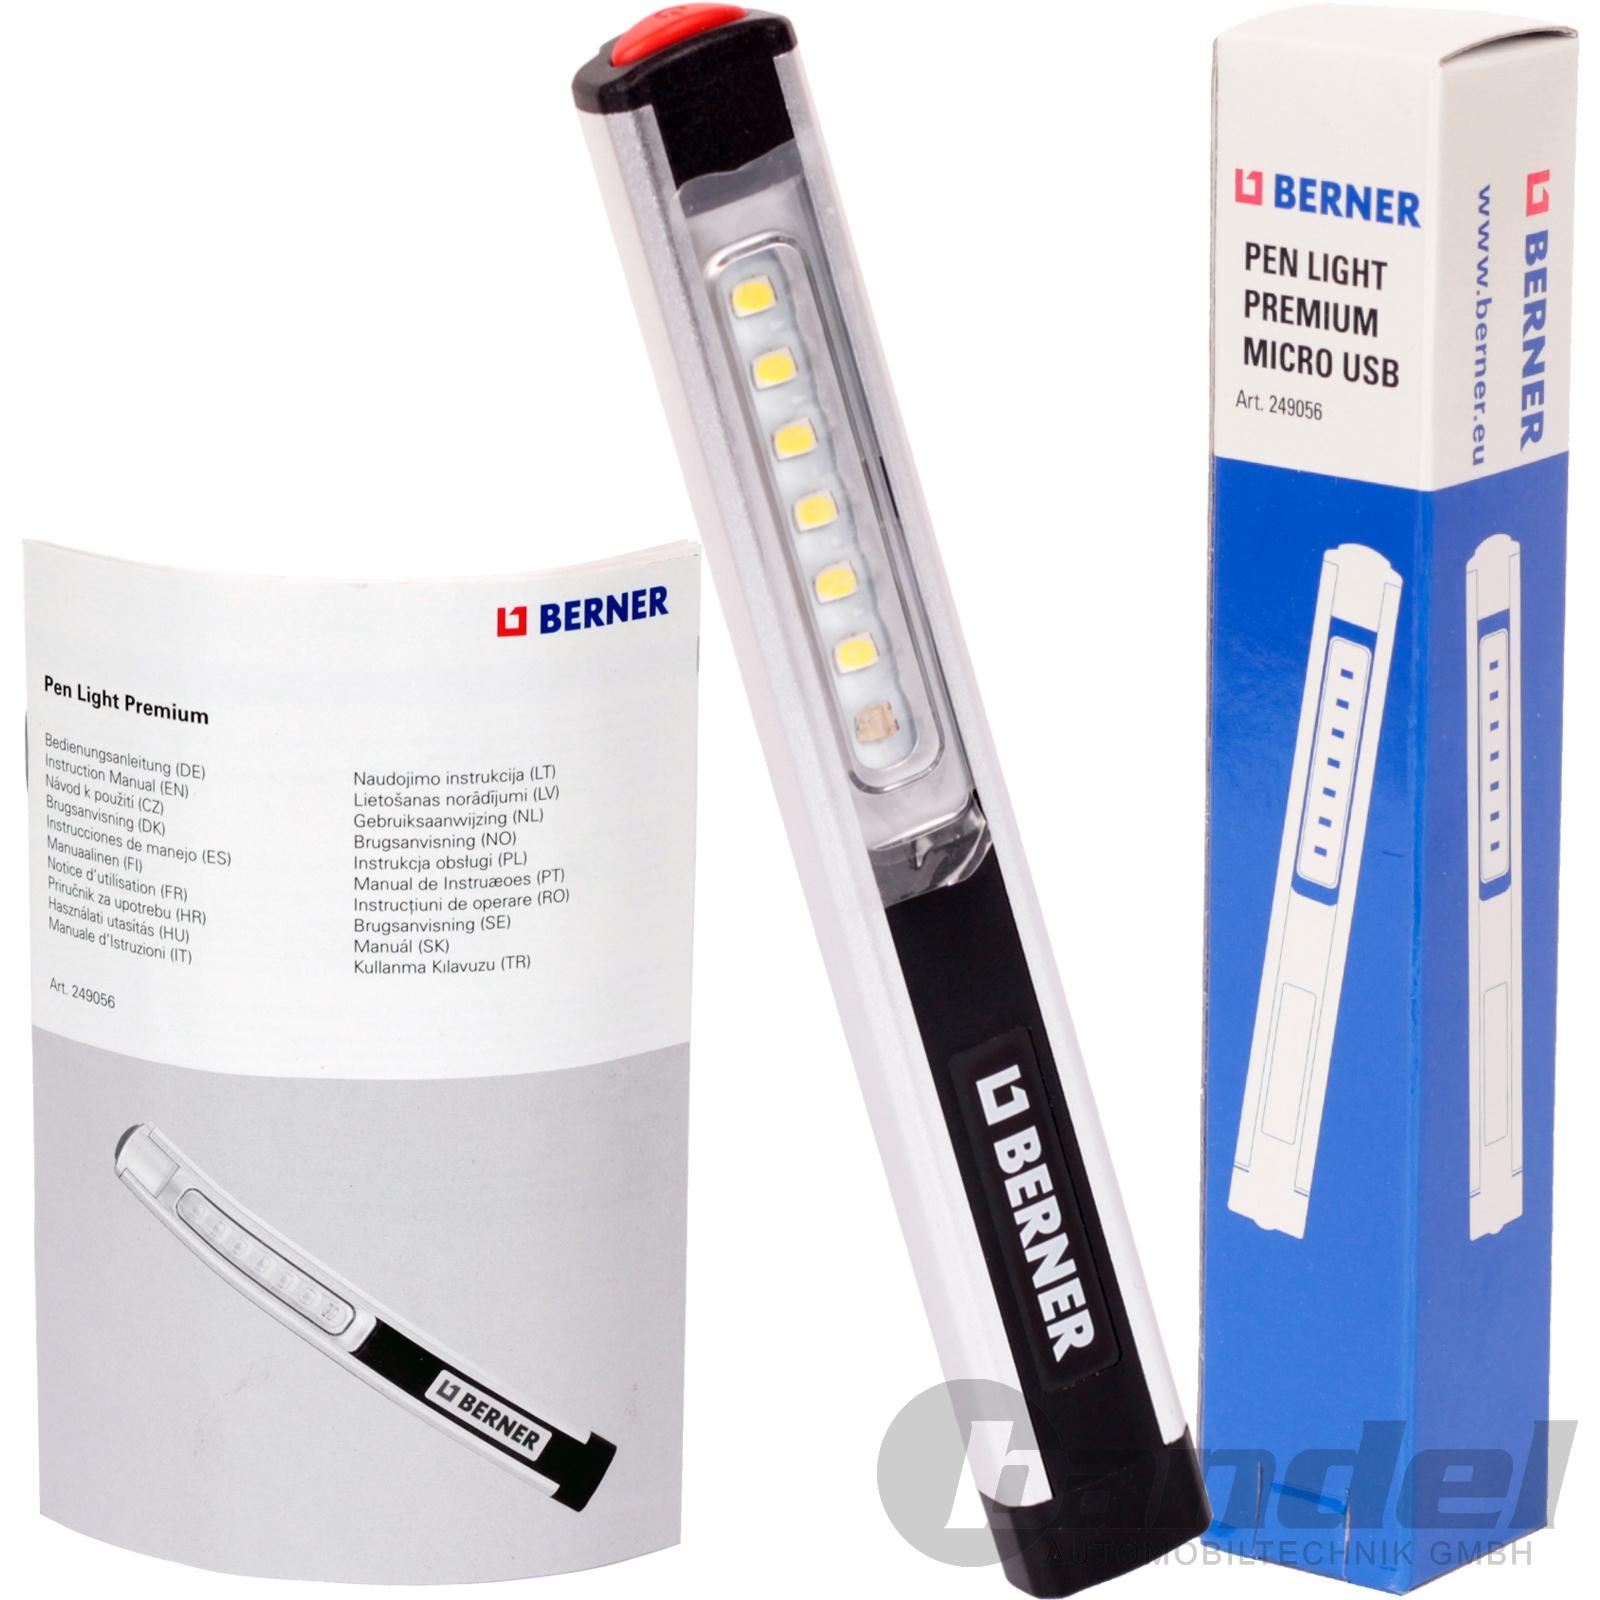 3x BERNER LED LAMPE PEN LIGHT PREMIUM USB LI IO AKKU